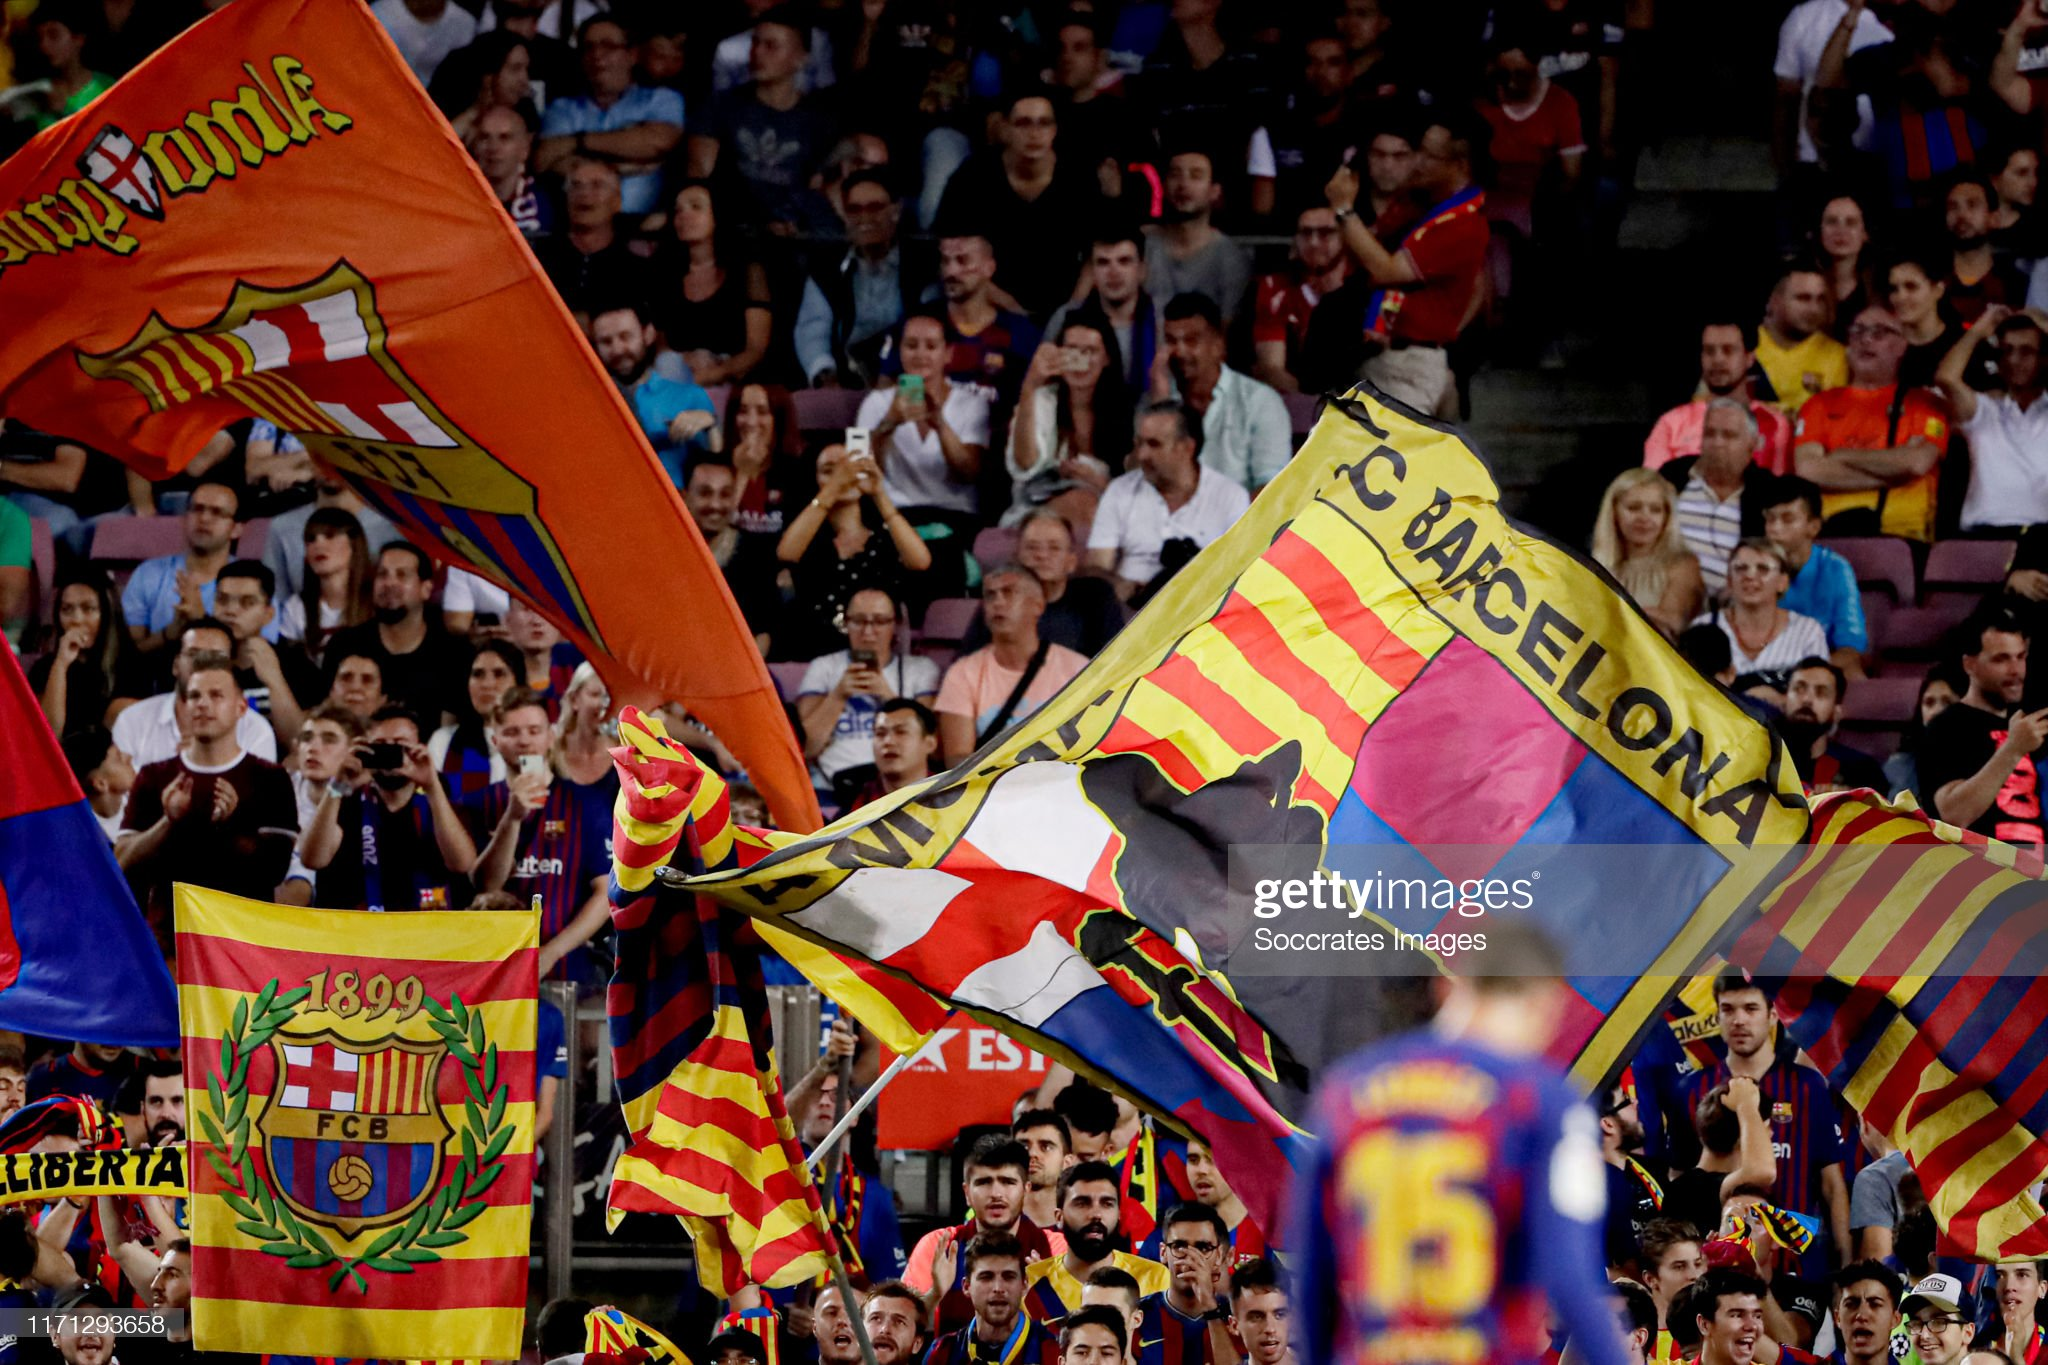 صور مباراة : برشلونة - فياريال 2-1 ( 24-09-2019 )  Supporters-of-fc-barcelona-during-the-la-liga-santander-match-between-picture-id1171293658?s=2048x2048